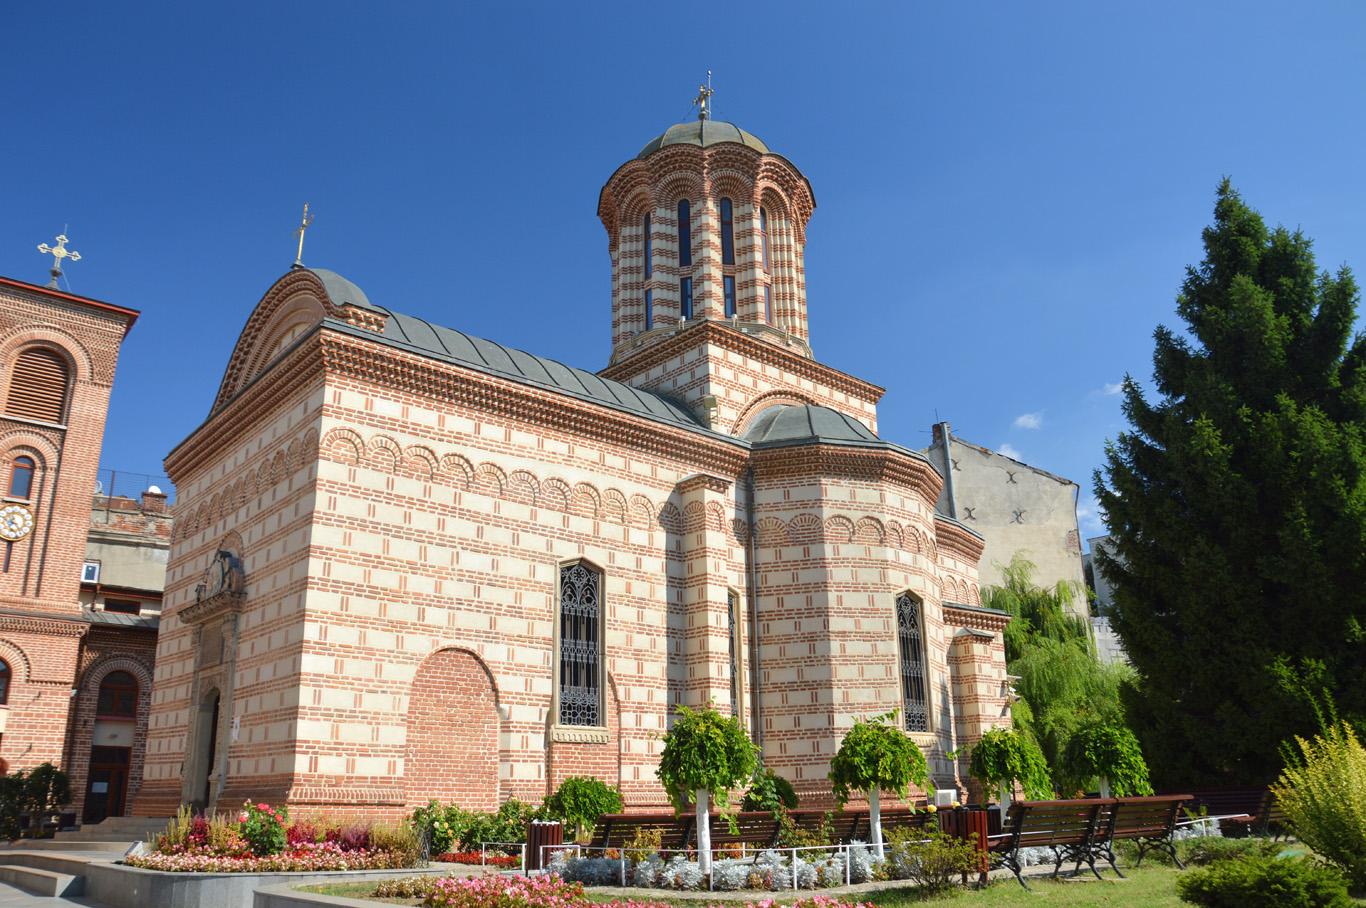 Annunciation Church of Saint Anthony